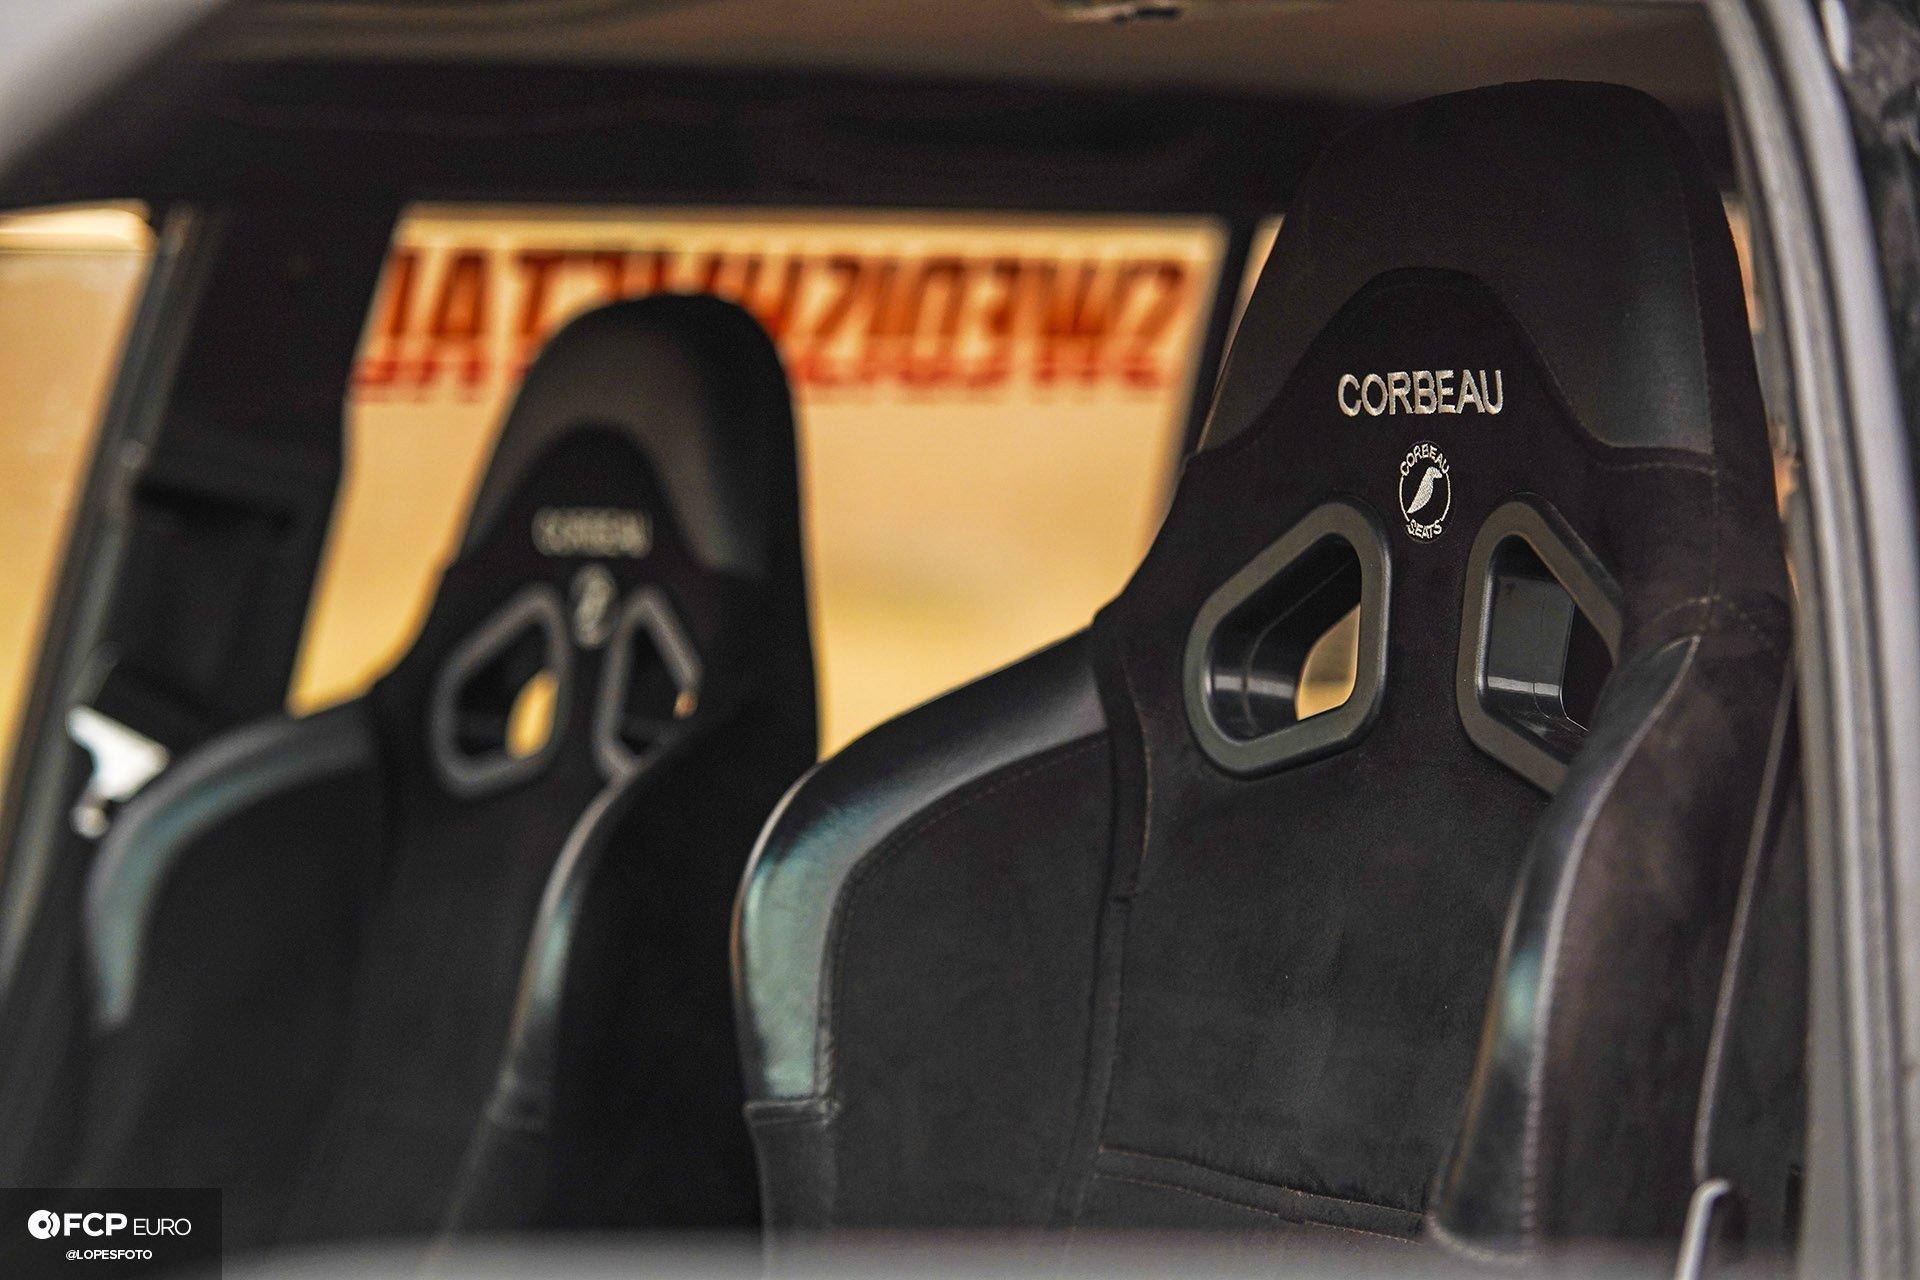 Swedish Metal Overlanding Volvo 940 Turbo Wagon Corbeau A4 Seats